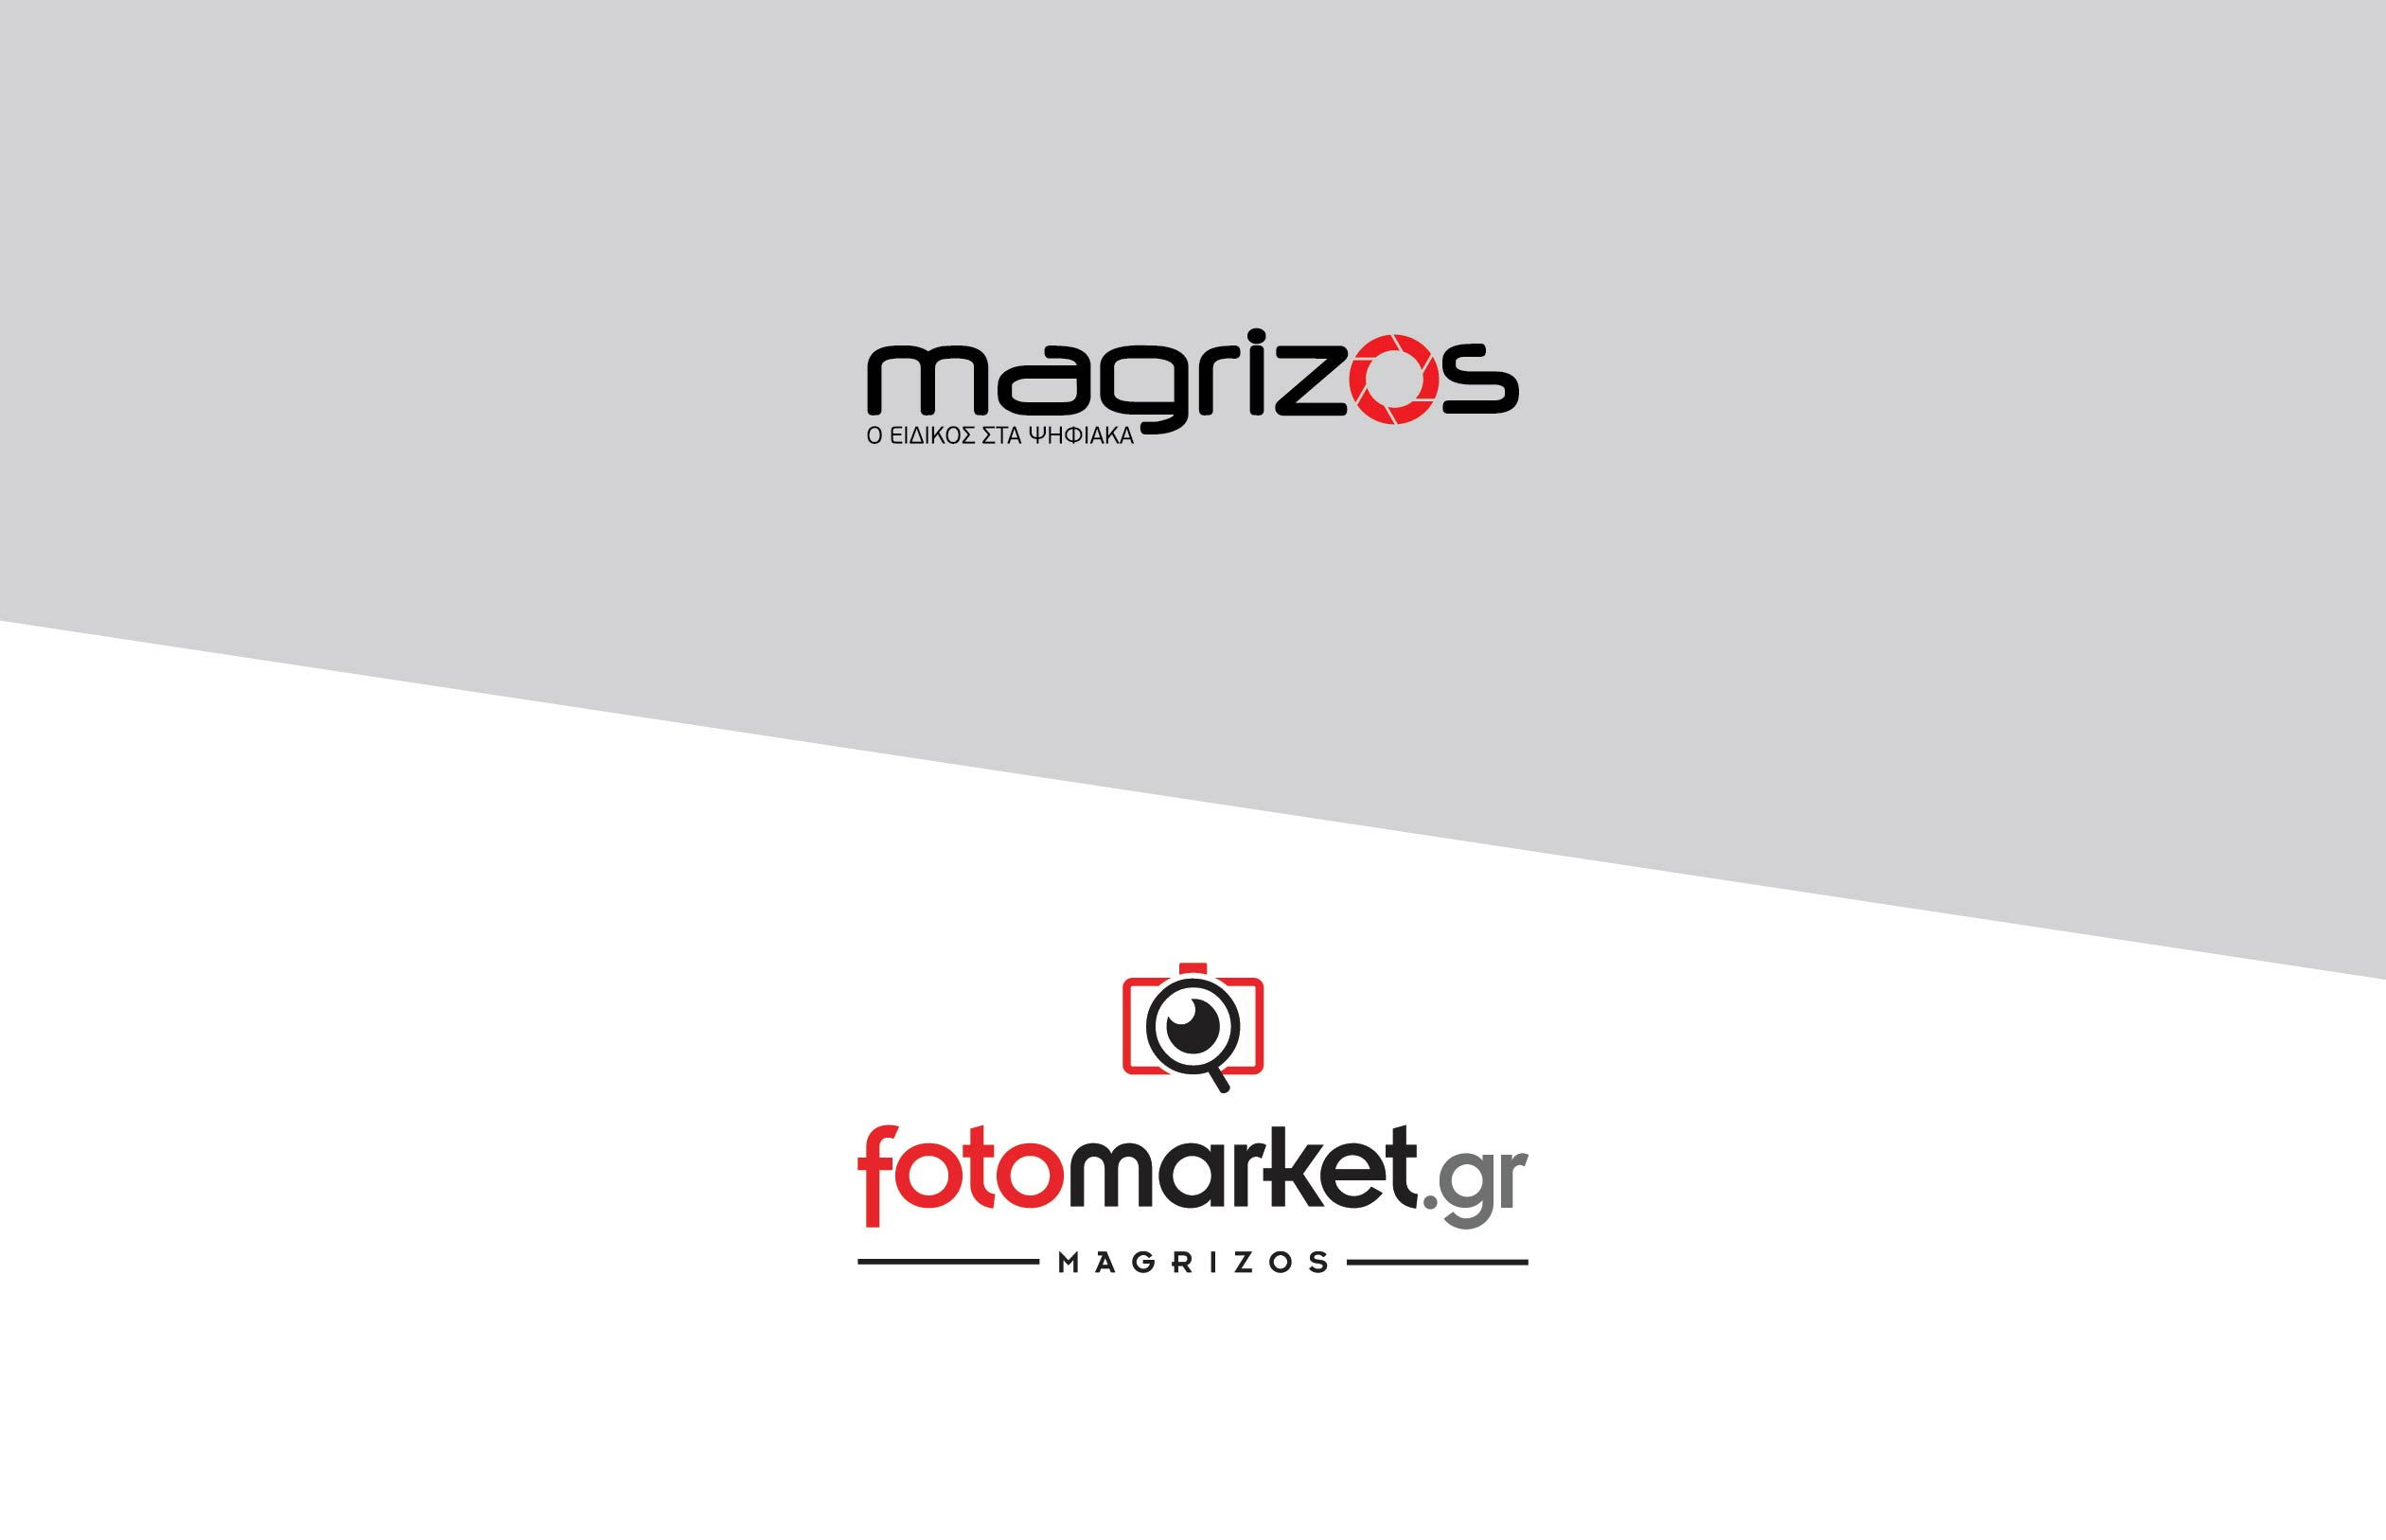 fotomagrizos-01